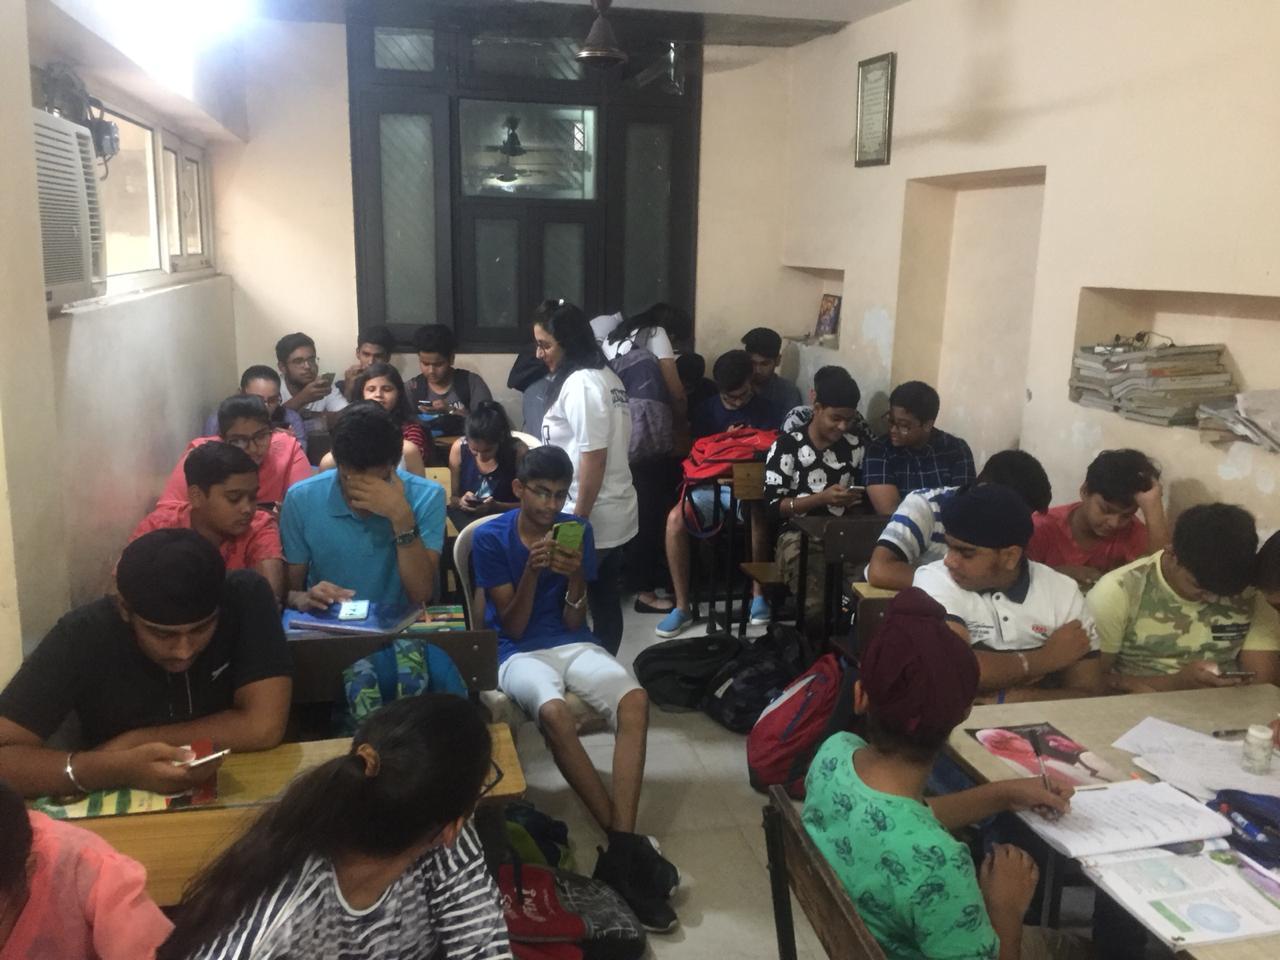 The study hut jalandhar.jpeg